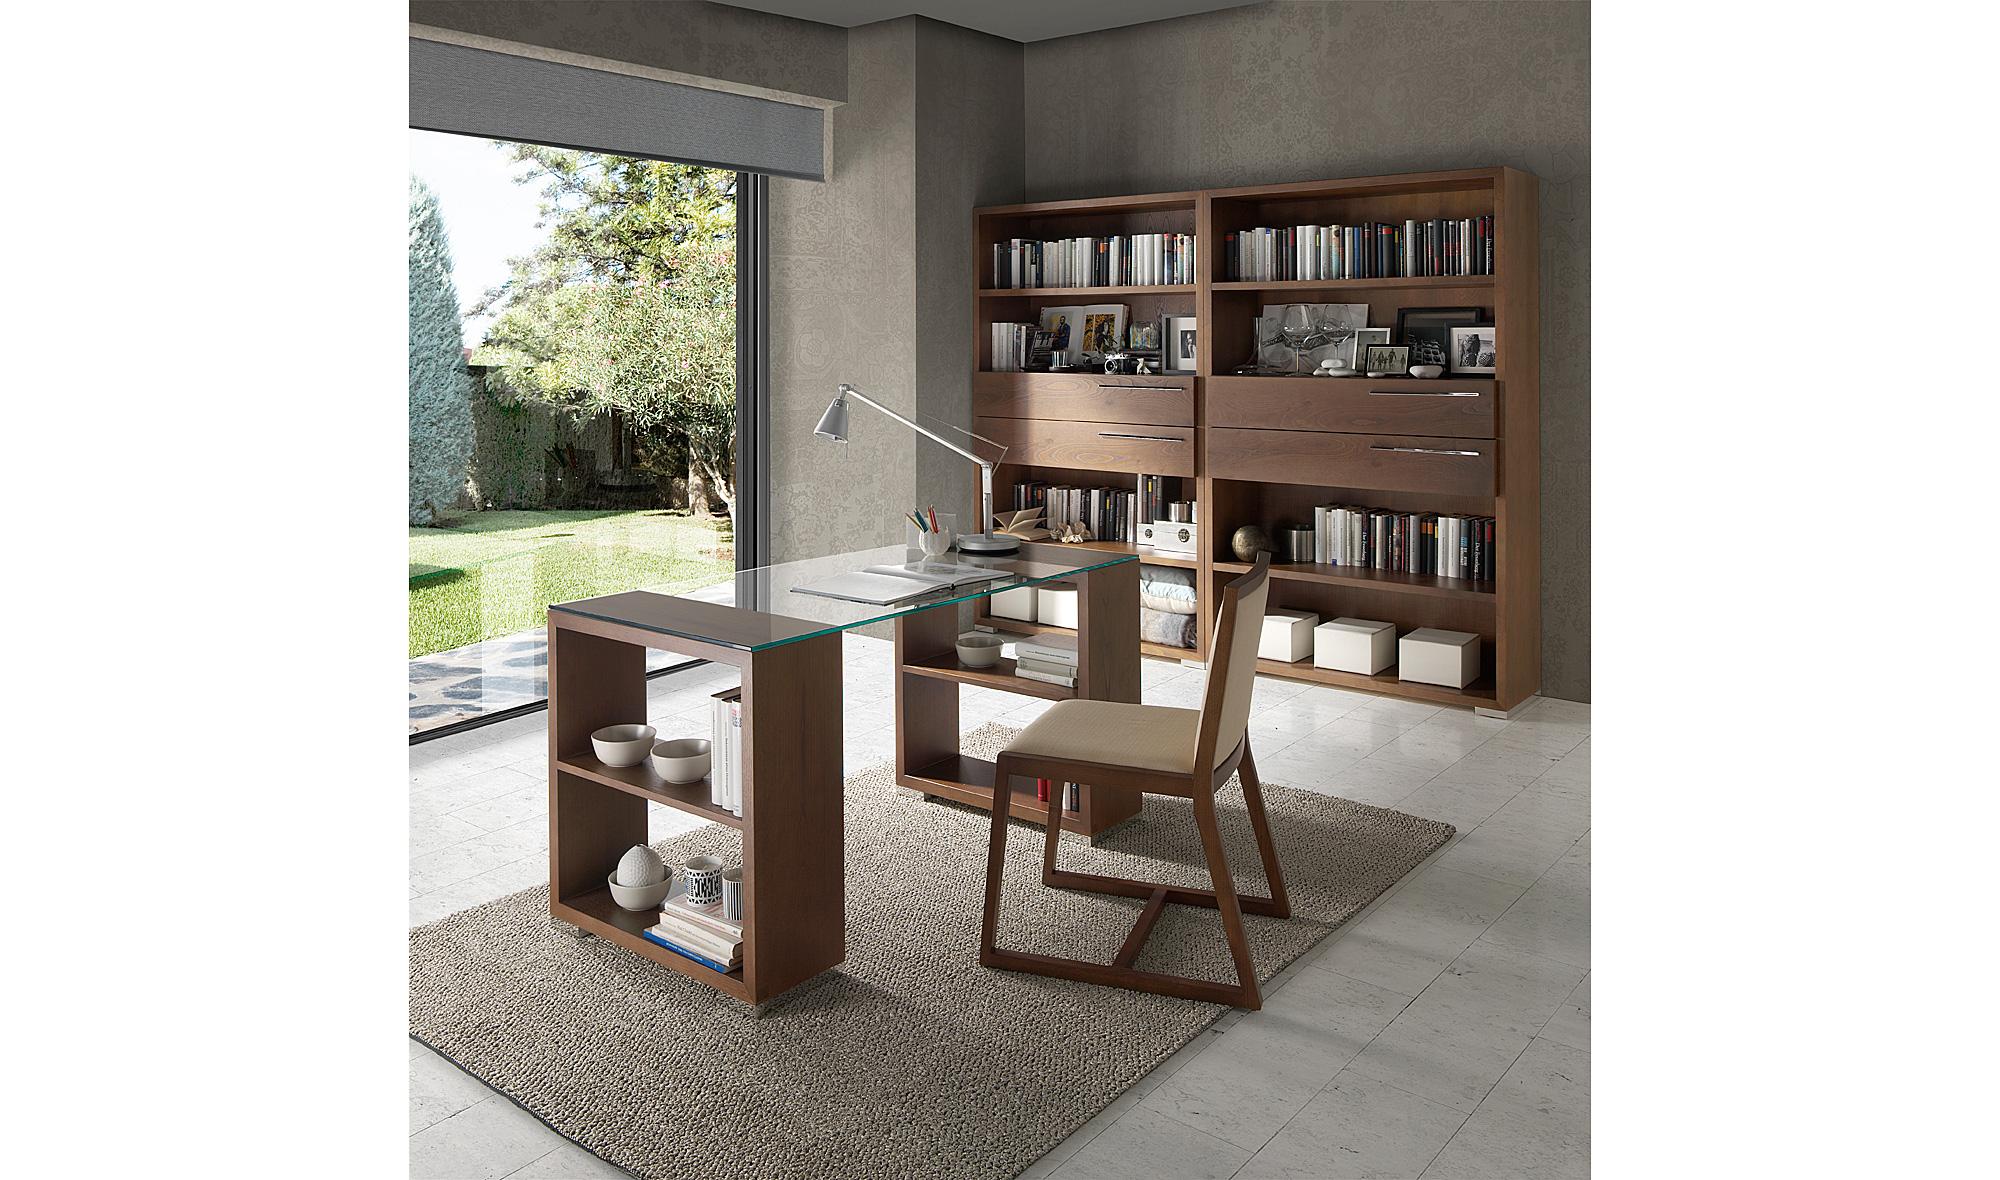 Mesa escritorio cristal grendy en - Mesas de escritorio de diseno ...